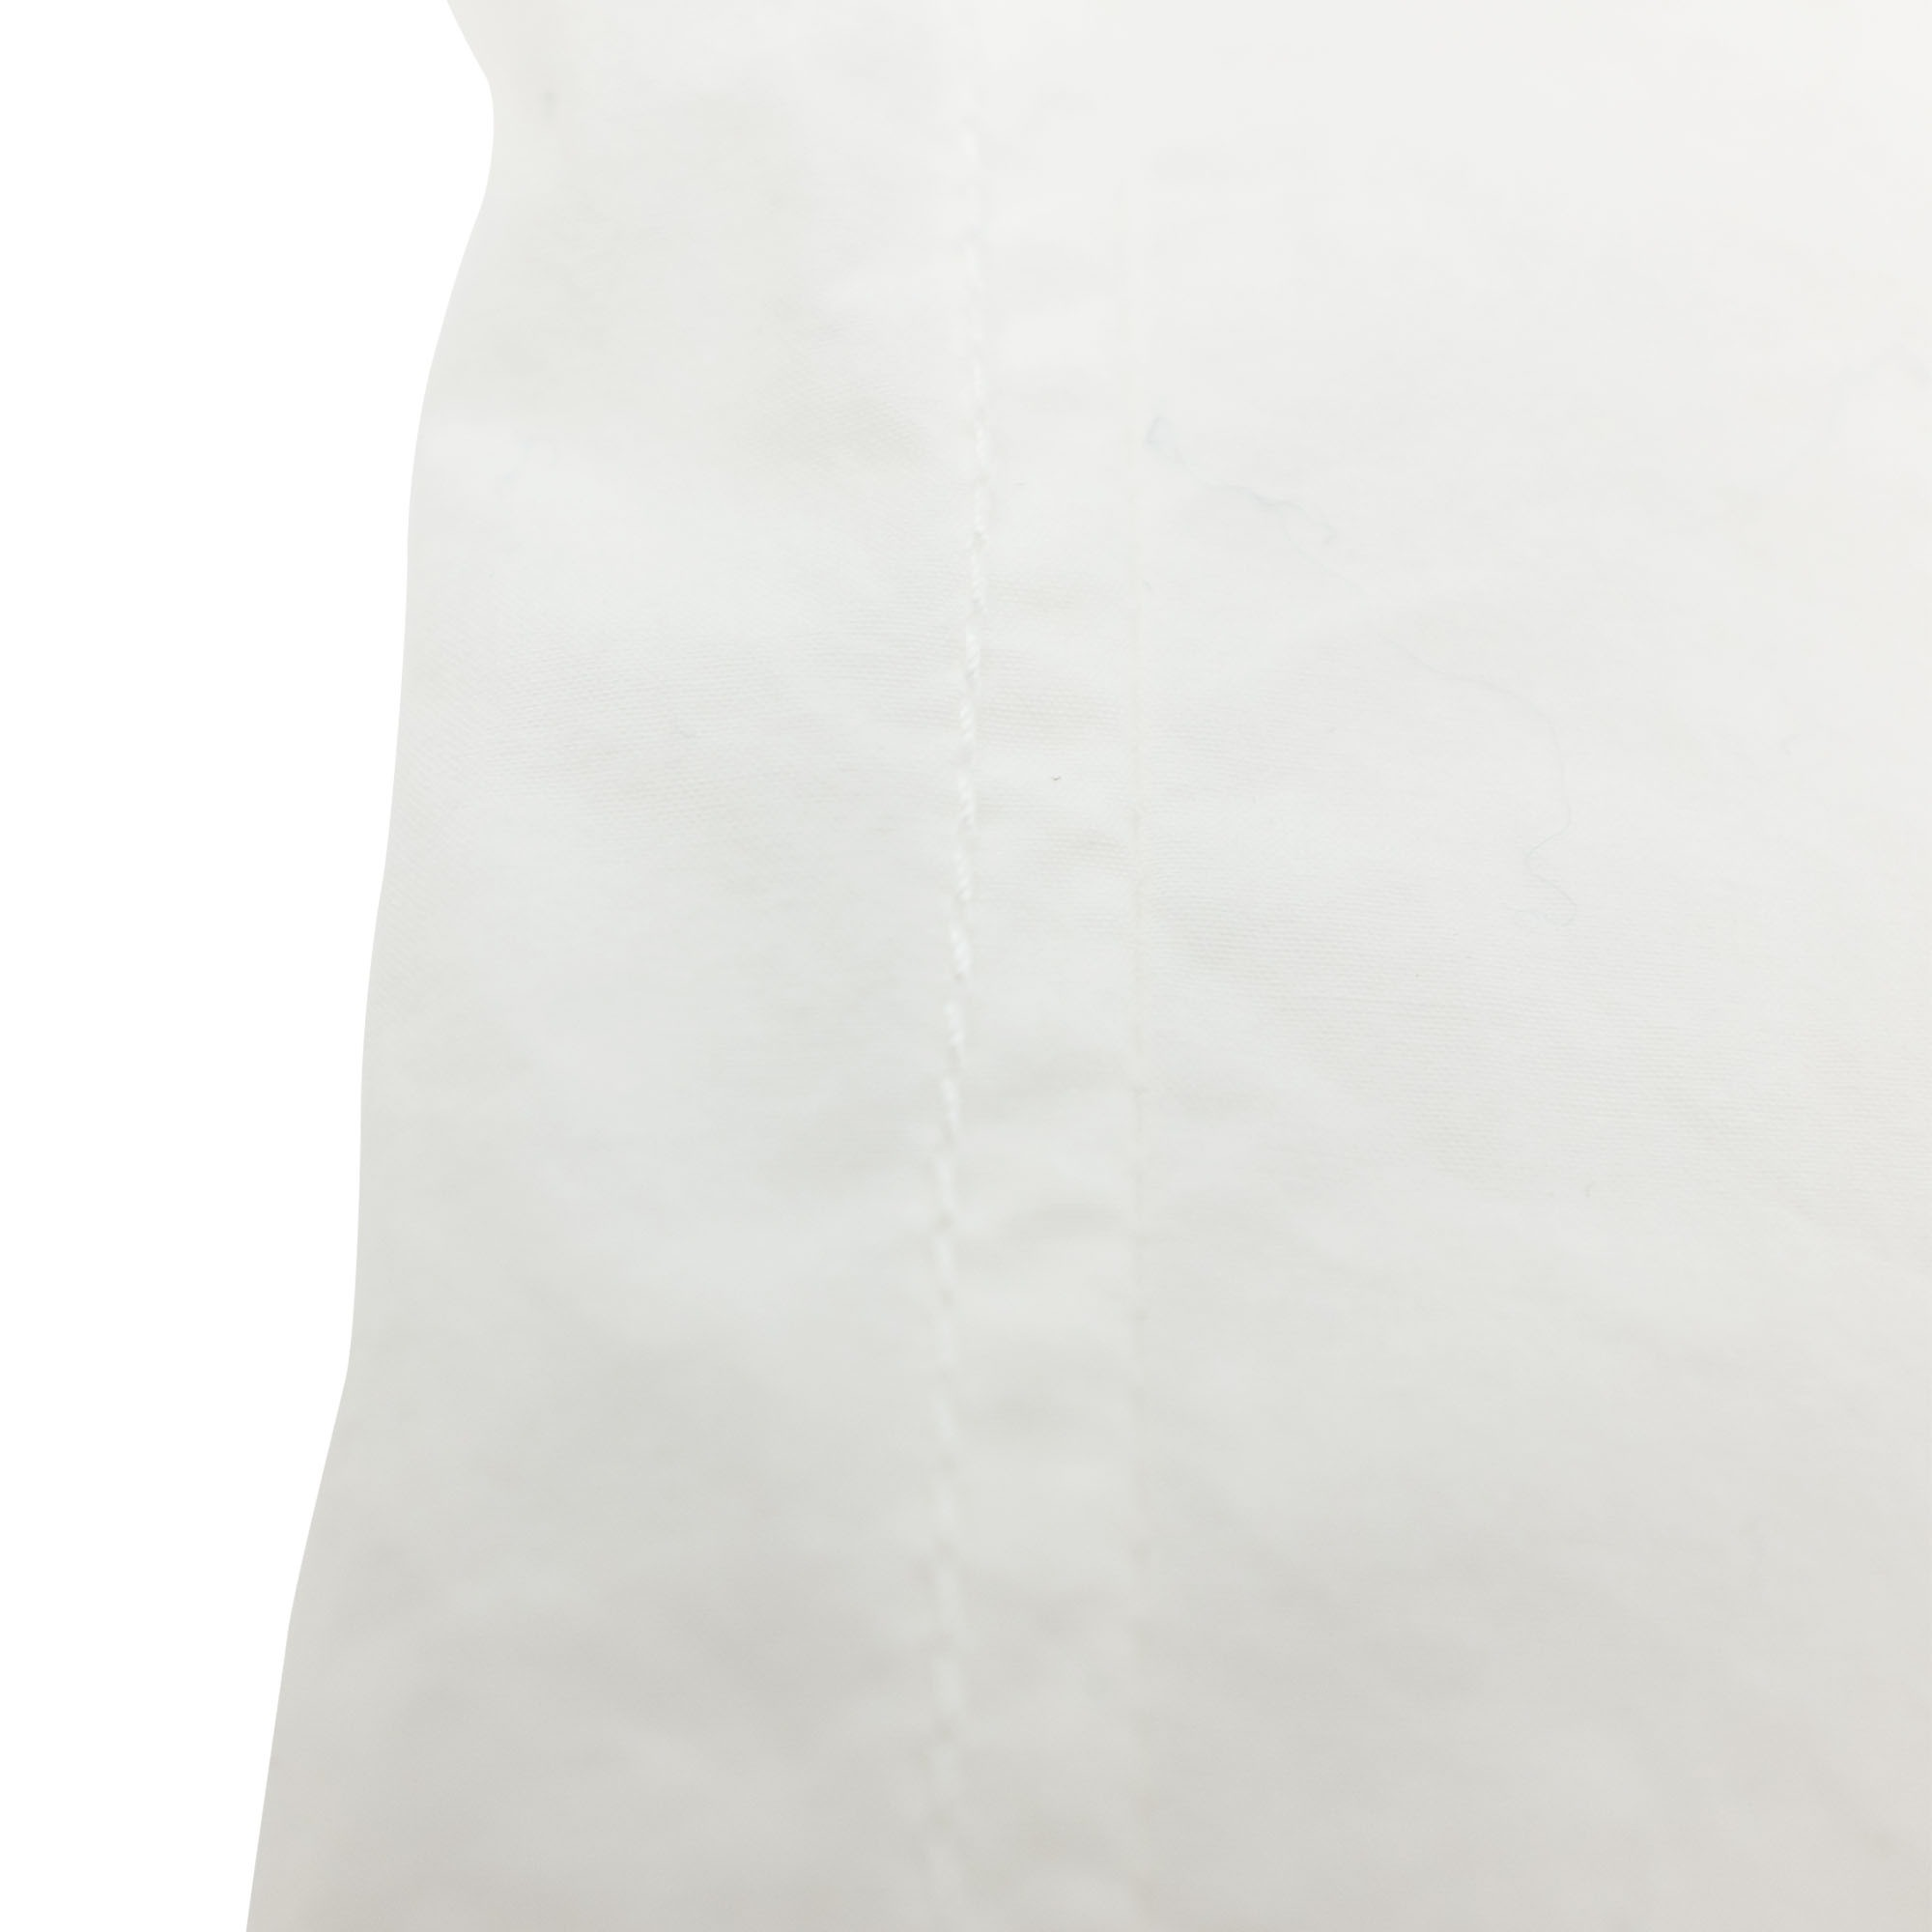 Dolman Sleeve S-S Shirt Off White 8